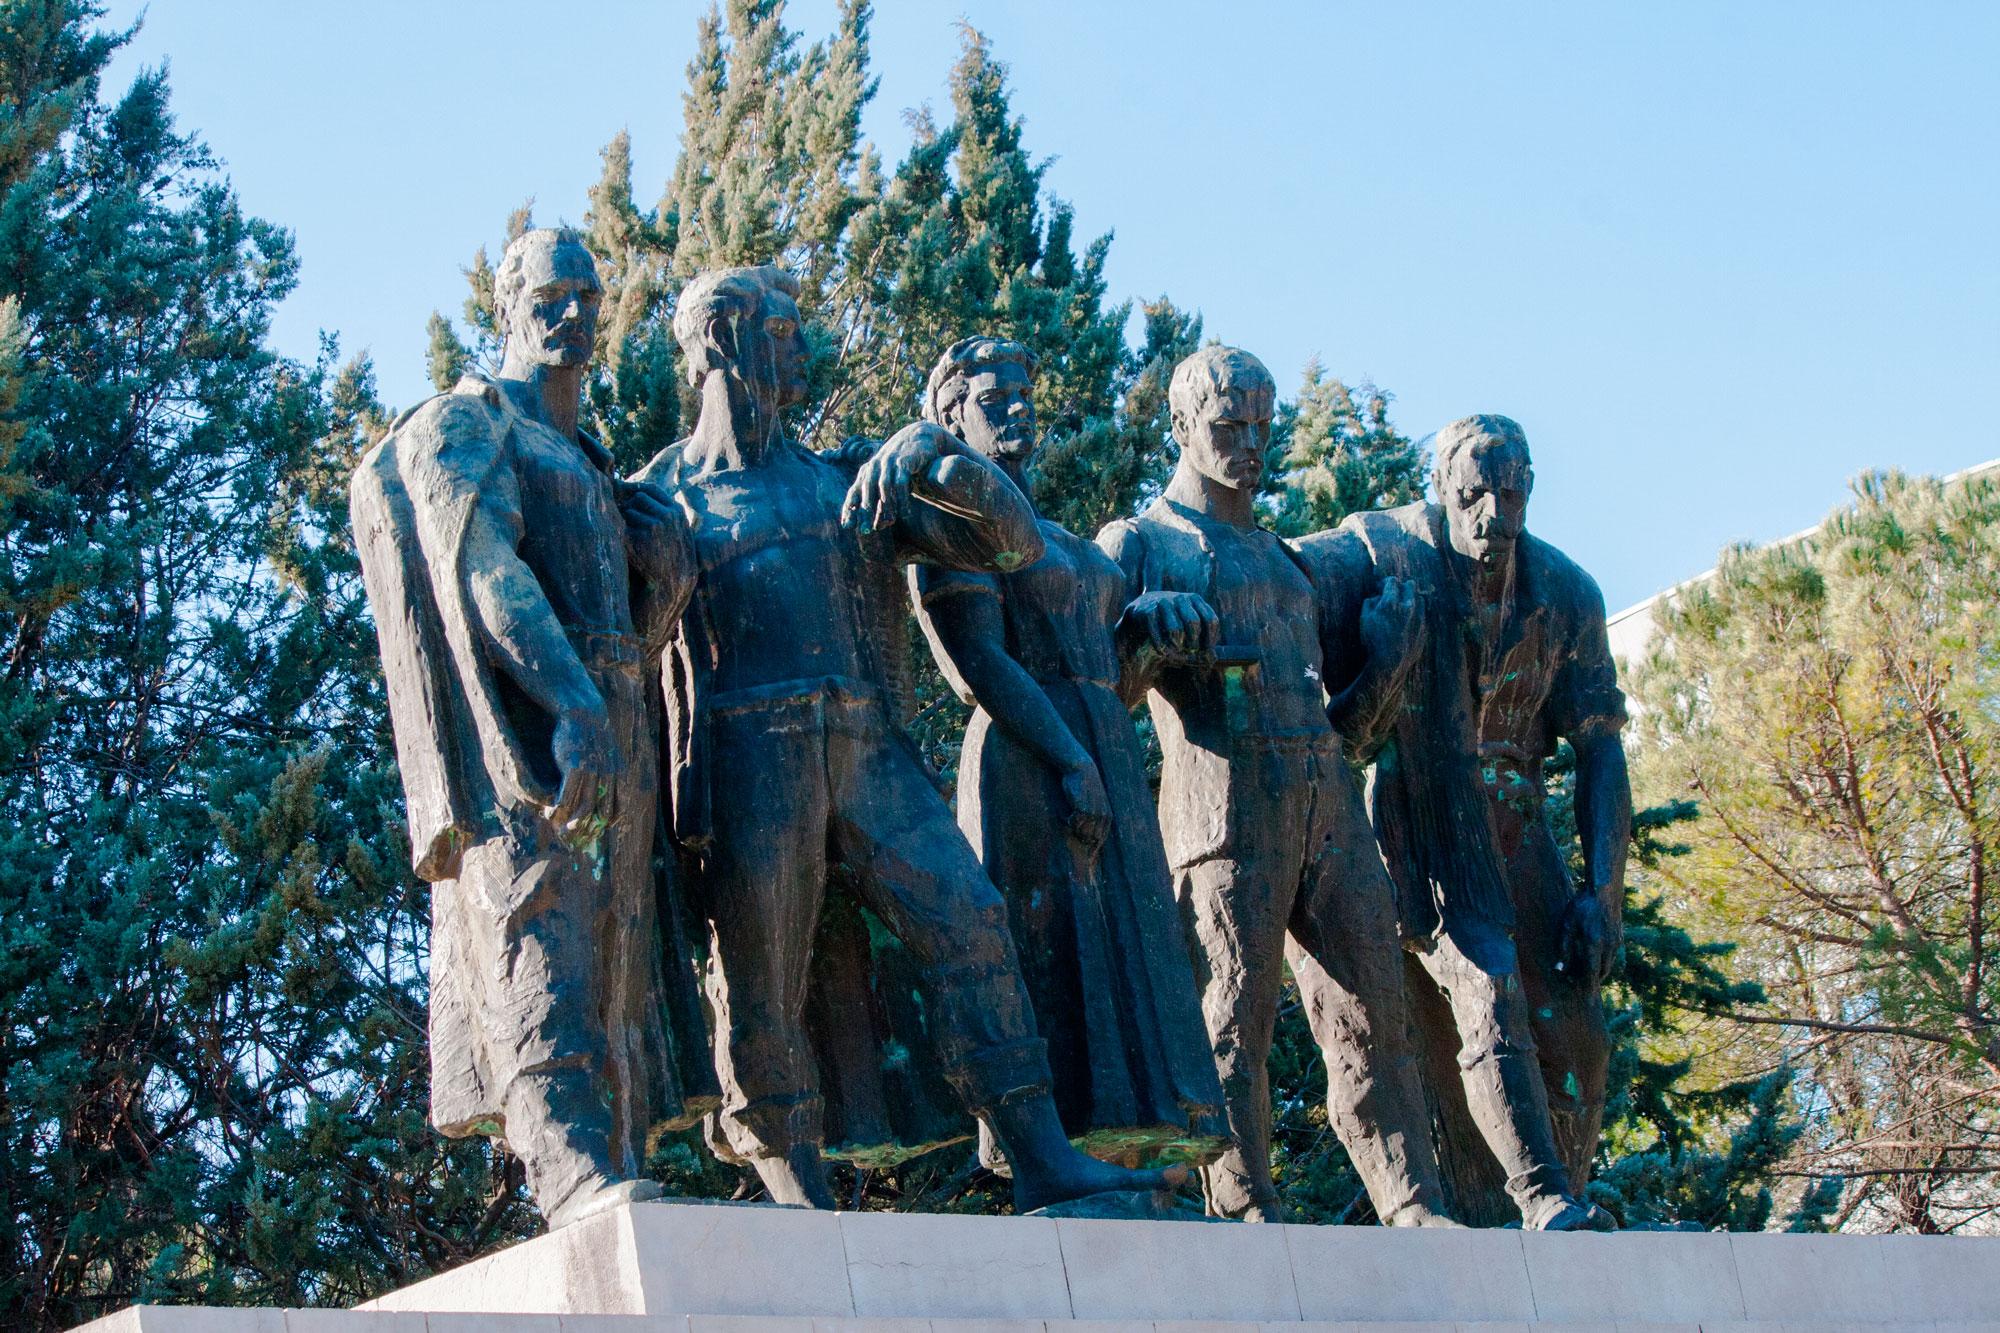 Spomenik Palim Borcima I Zrtvama Fasizma Iz Drugog Svjetskog Rata